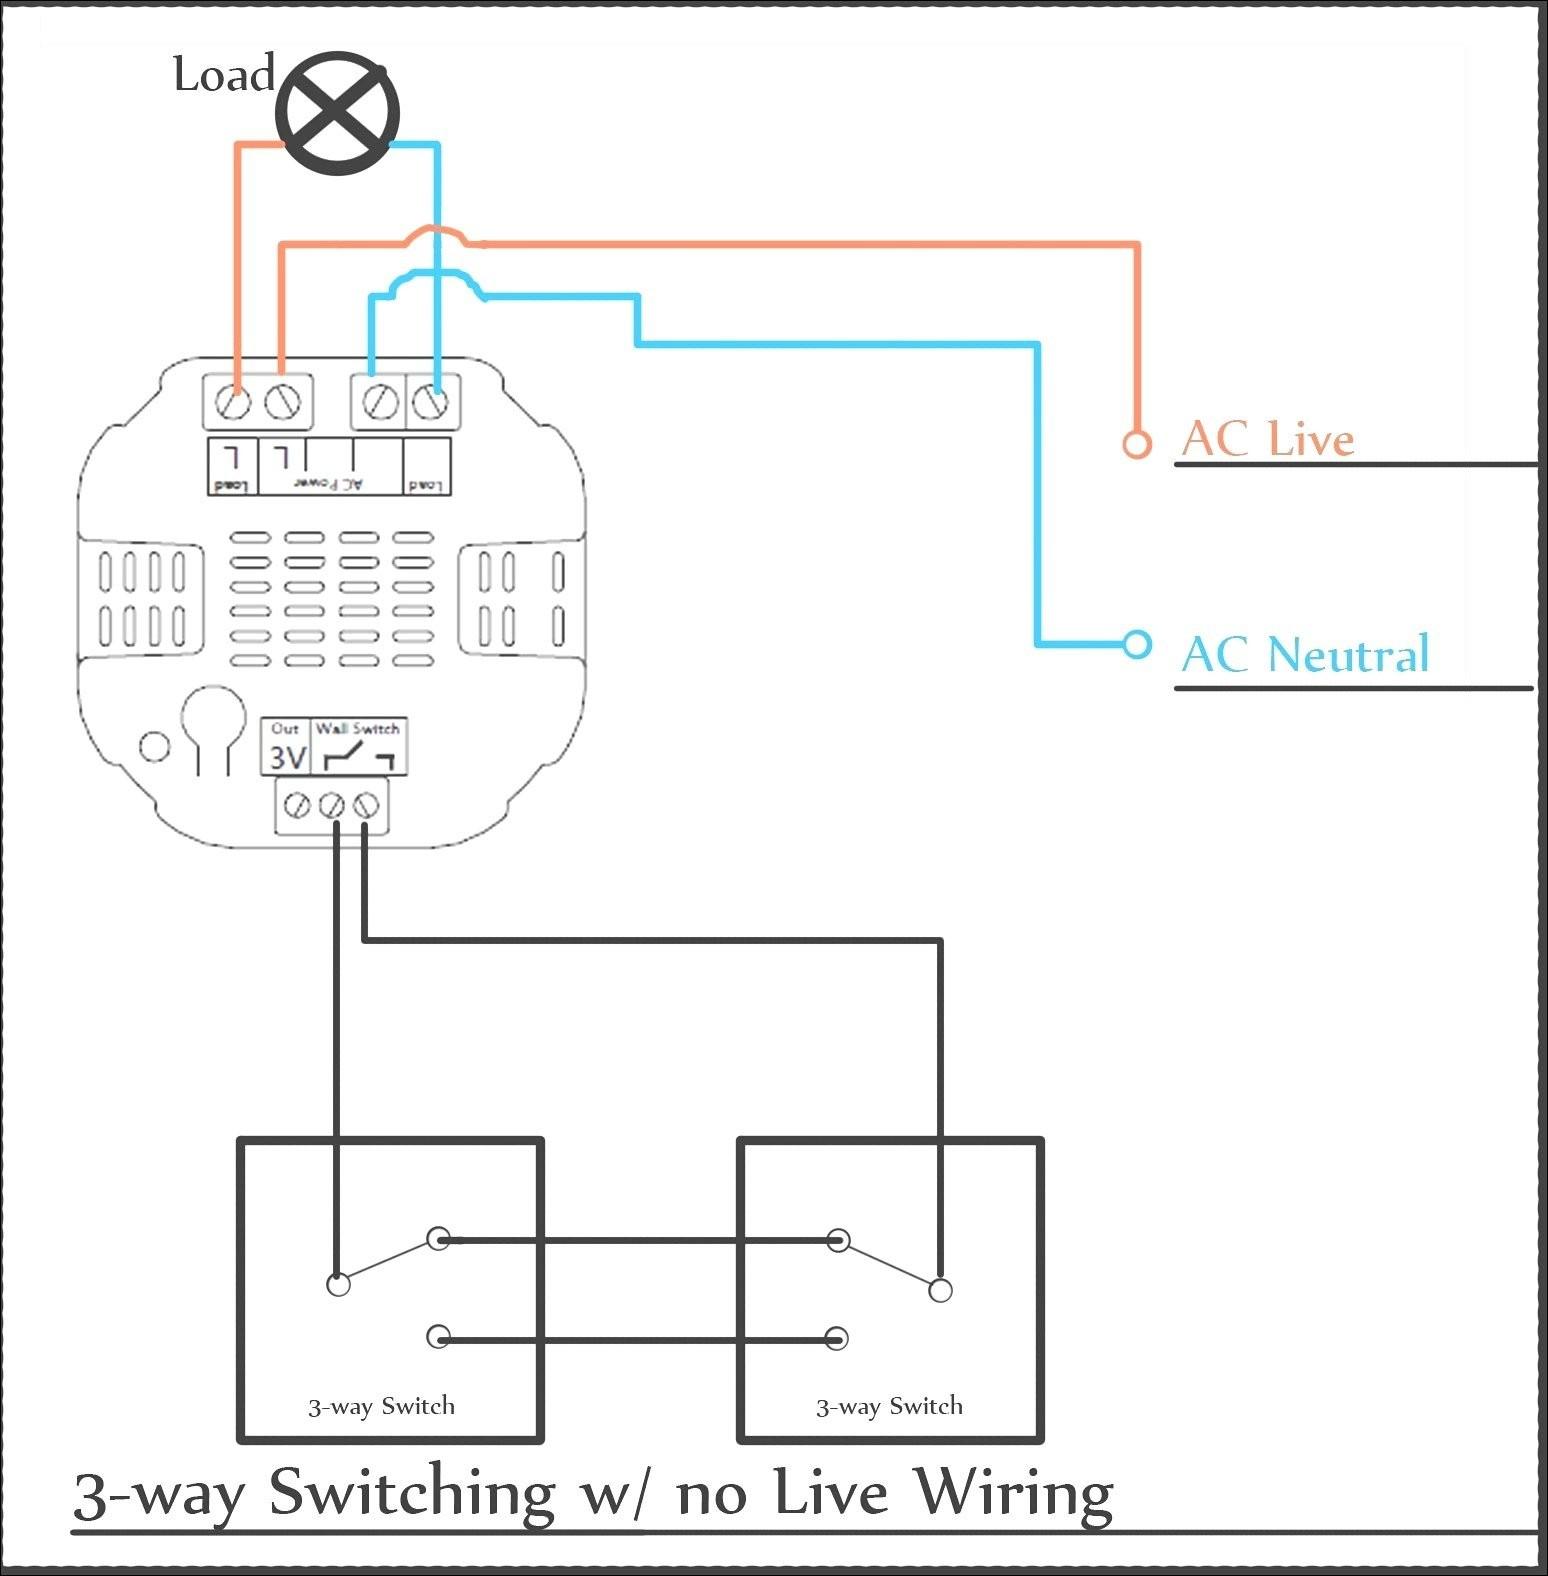 Zing Ear Switch Wiring Diagram Inspirational Image Rm4 Leviton 3 Way Decora That Photograph